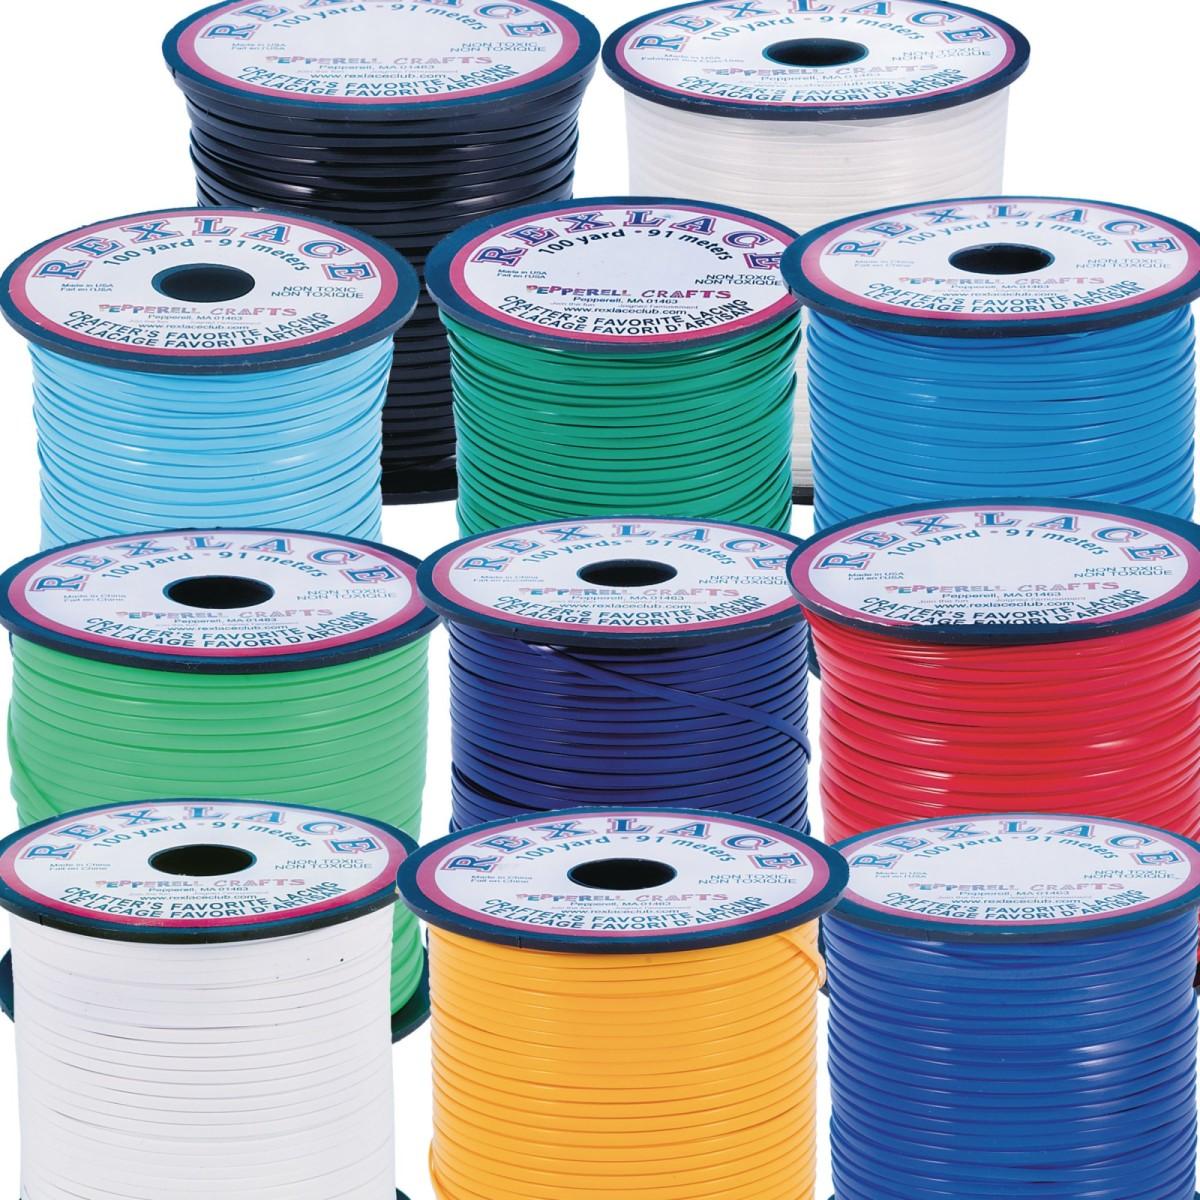 Rexlace® Lacing, 100-yd. Spool-NEON ORANGE